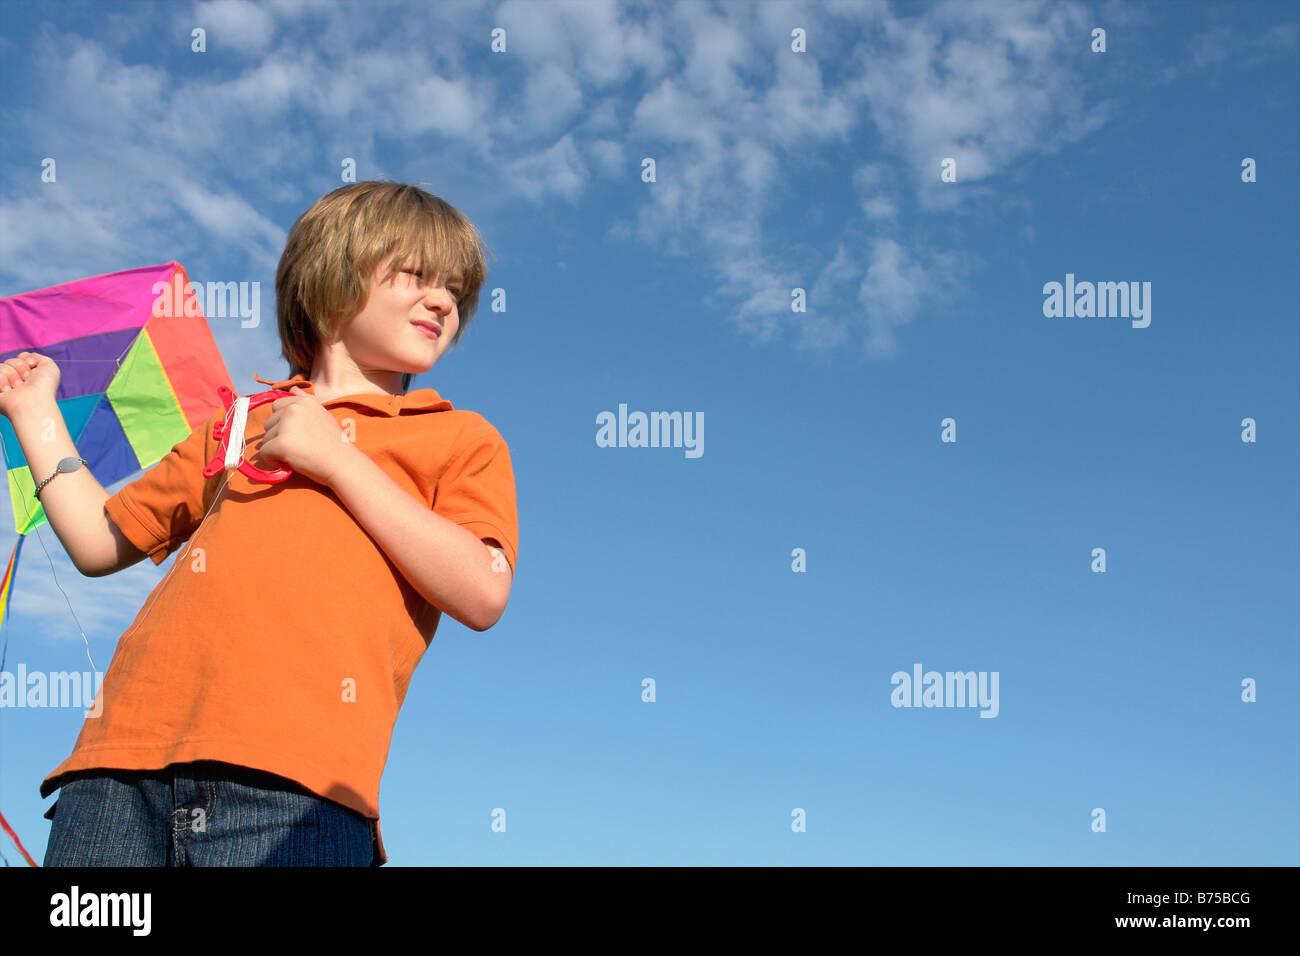 Six year old boy holding kite, Winnipeg, Canada - Stock Image